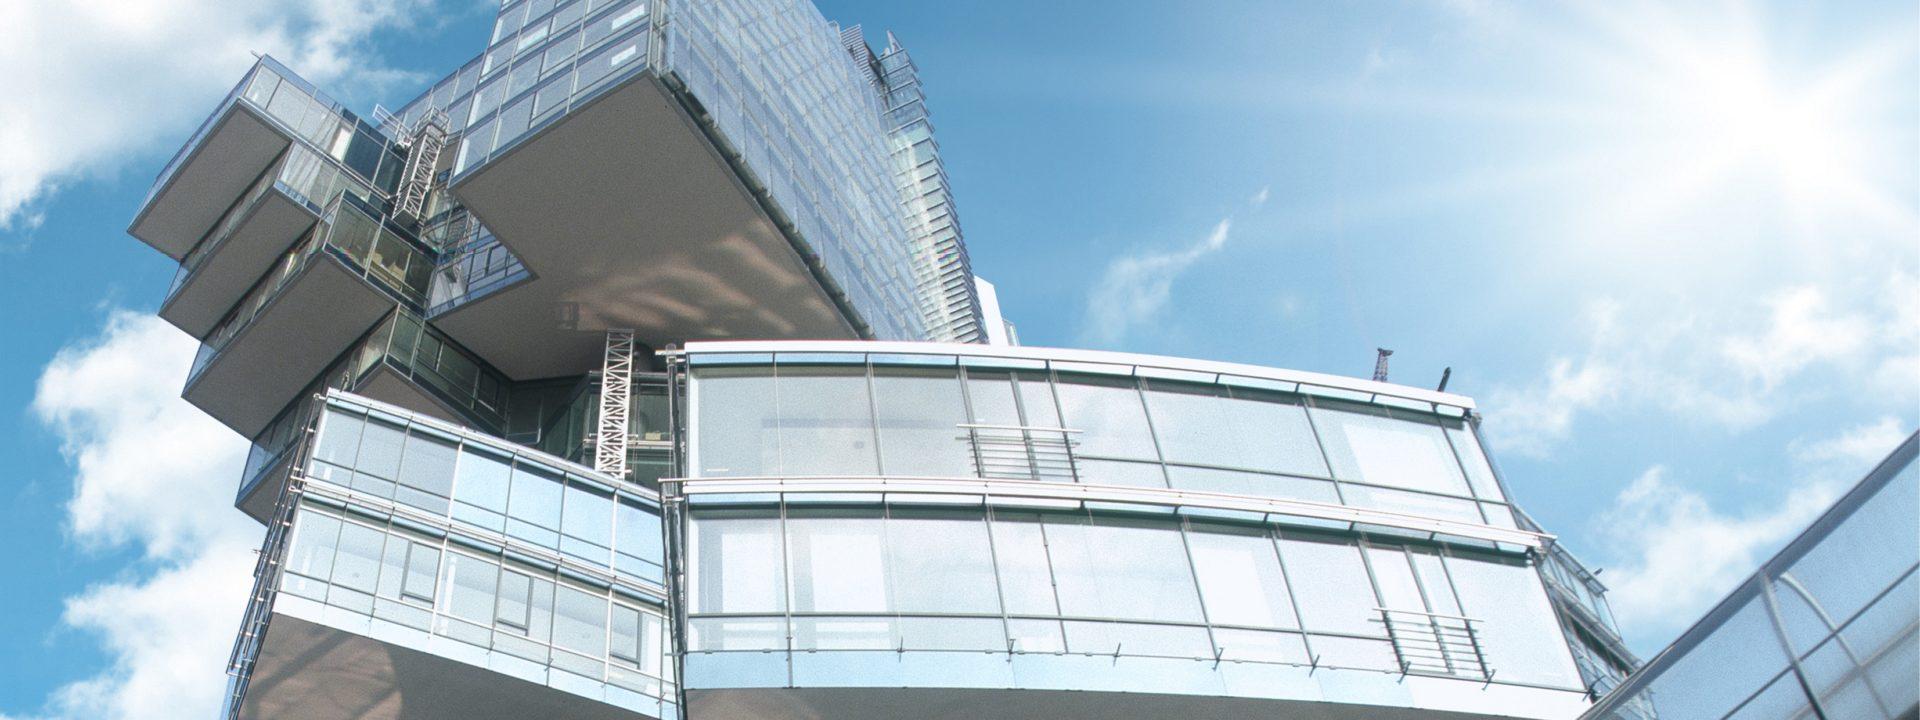 Insulating glass manufacturing